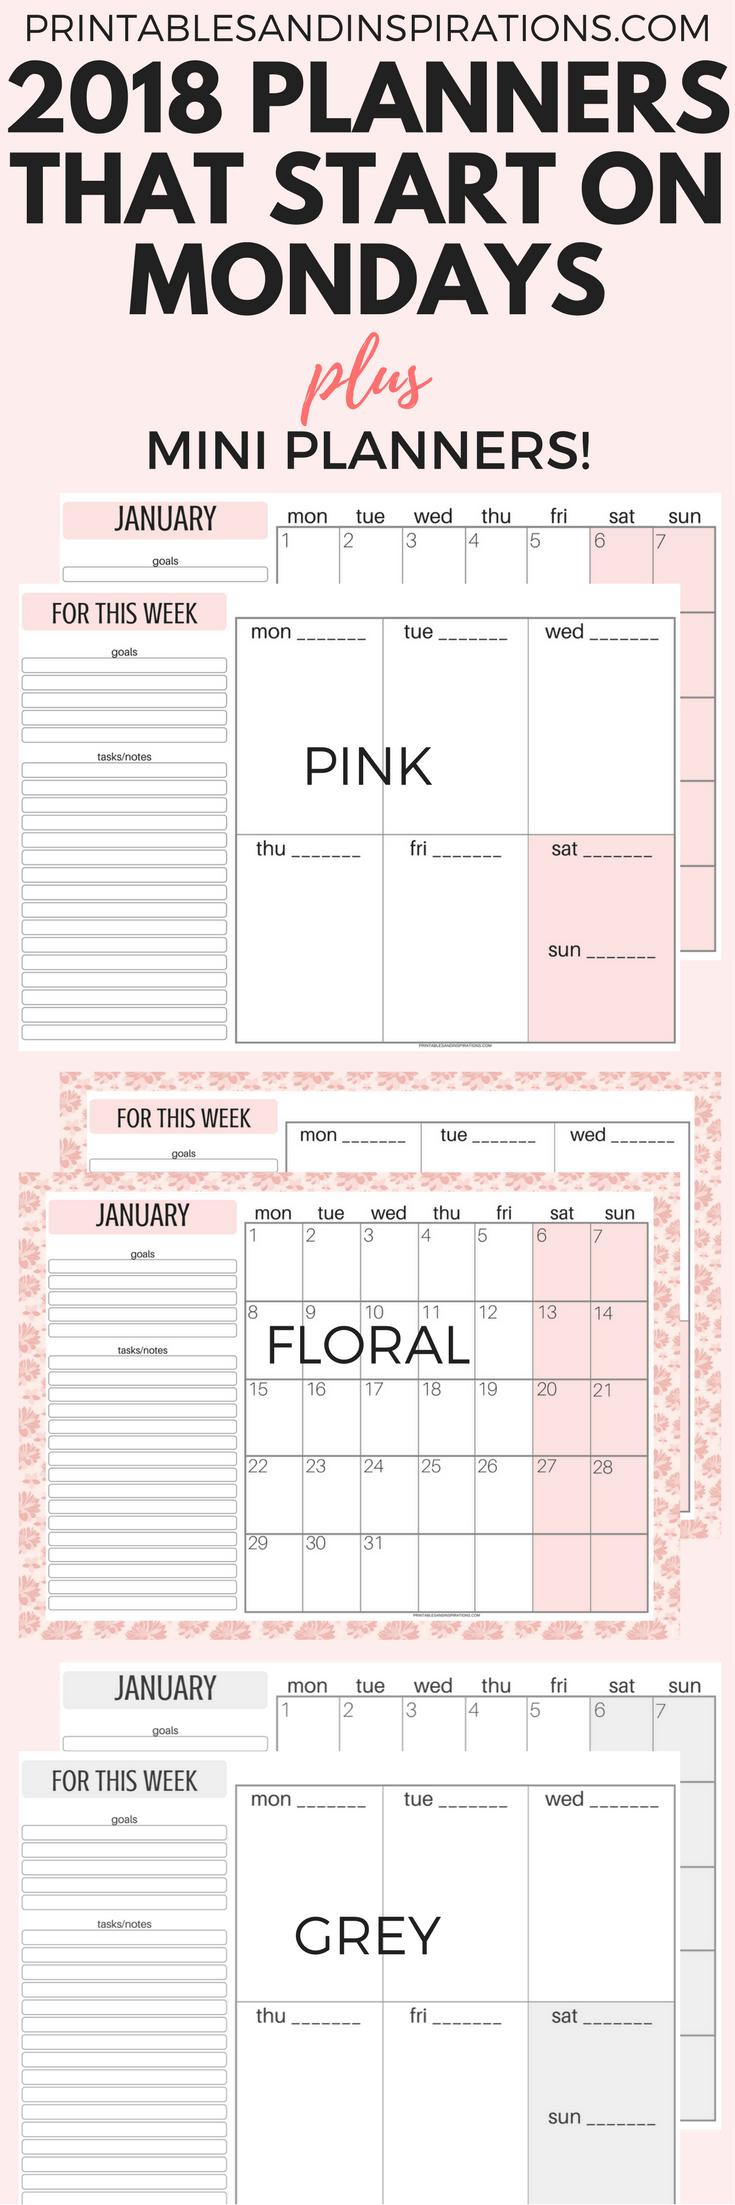 monday calendar 2018 monday start calendar 2018 monday to sunday calendar 2018 monday to sunday weekly planner calendar week starting on monday